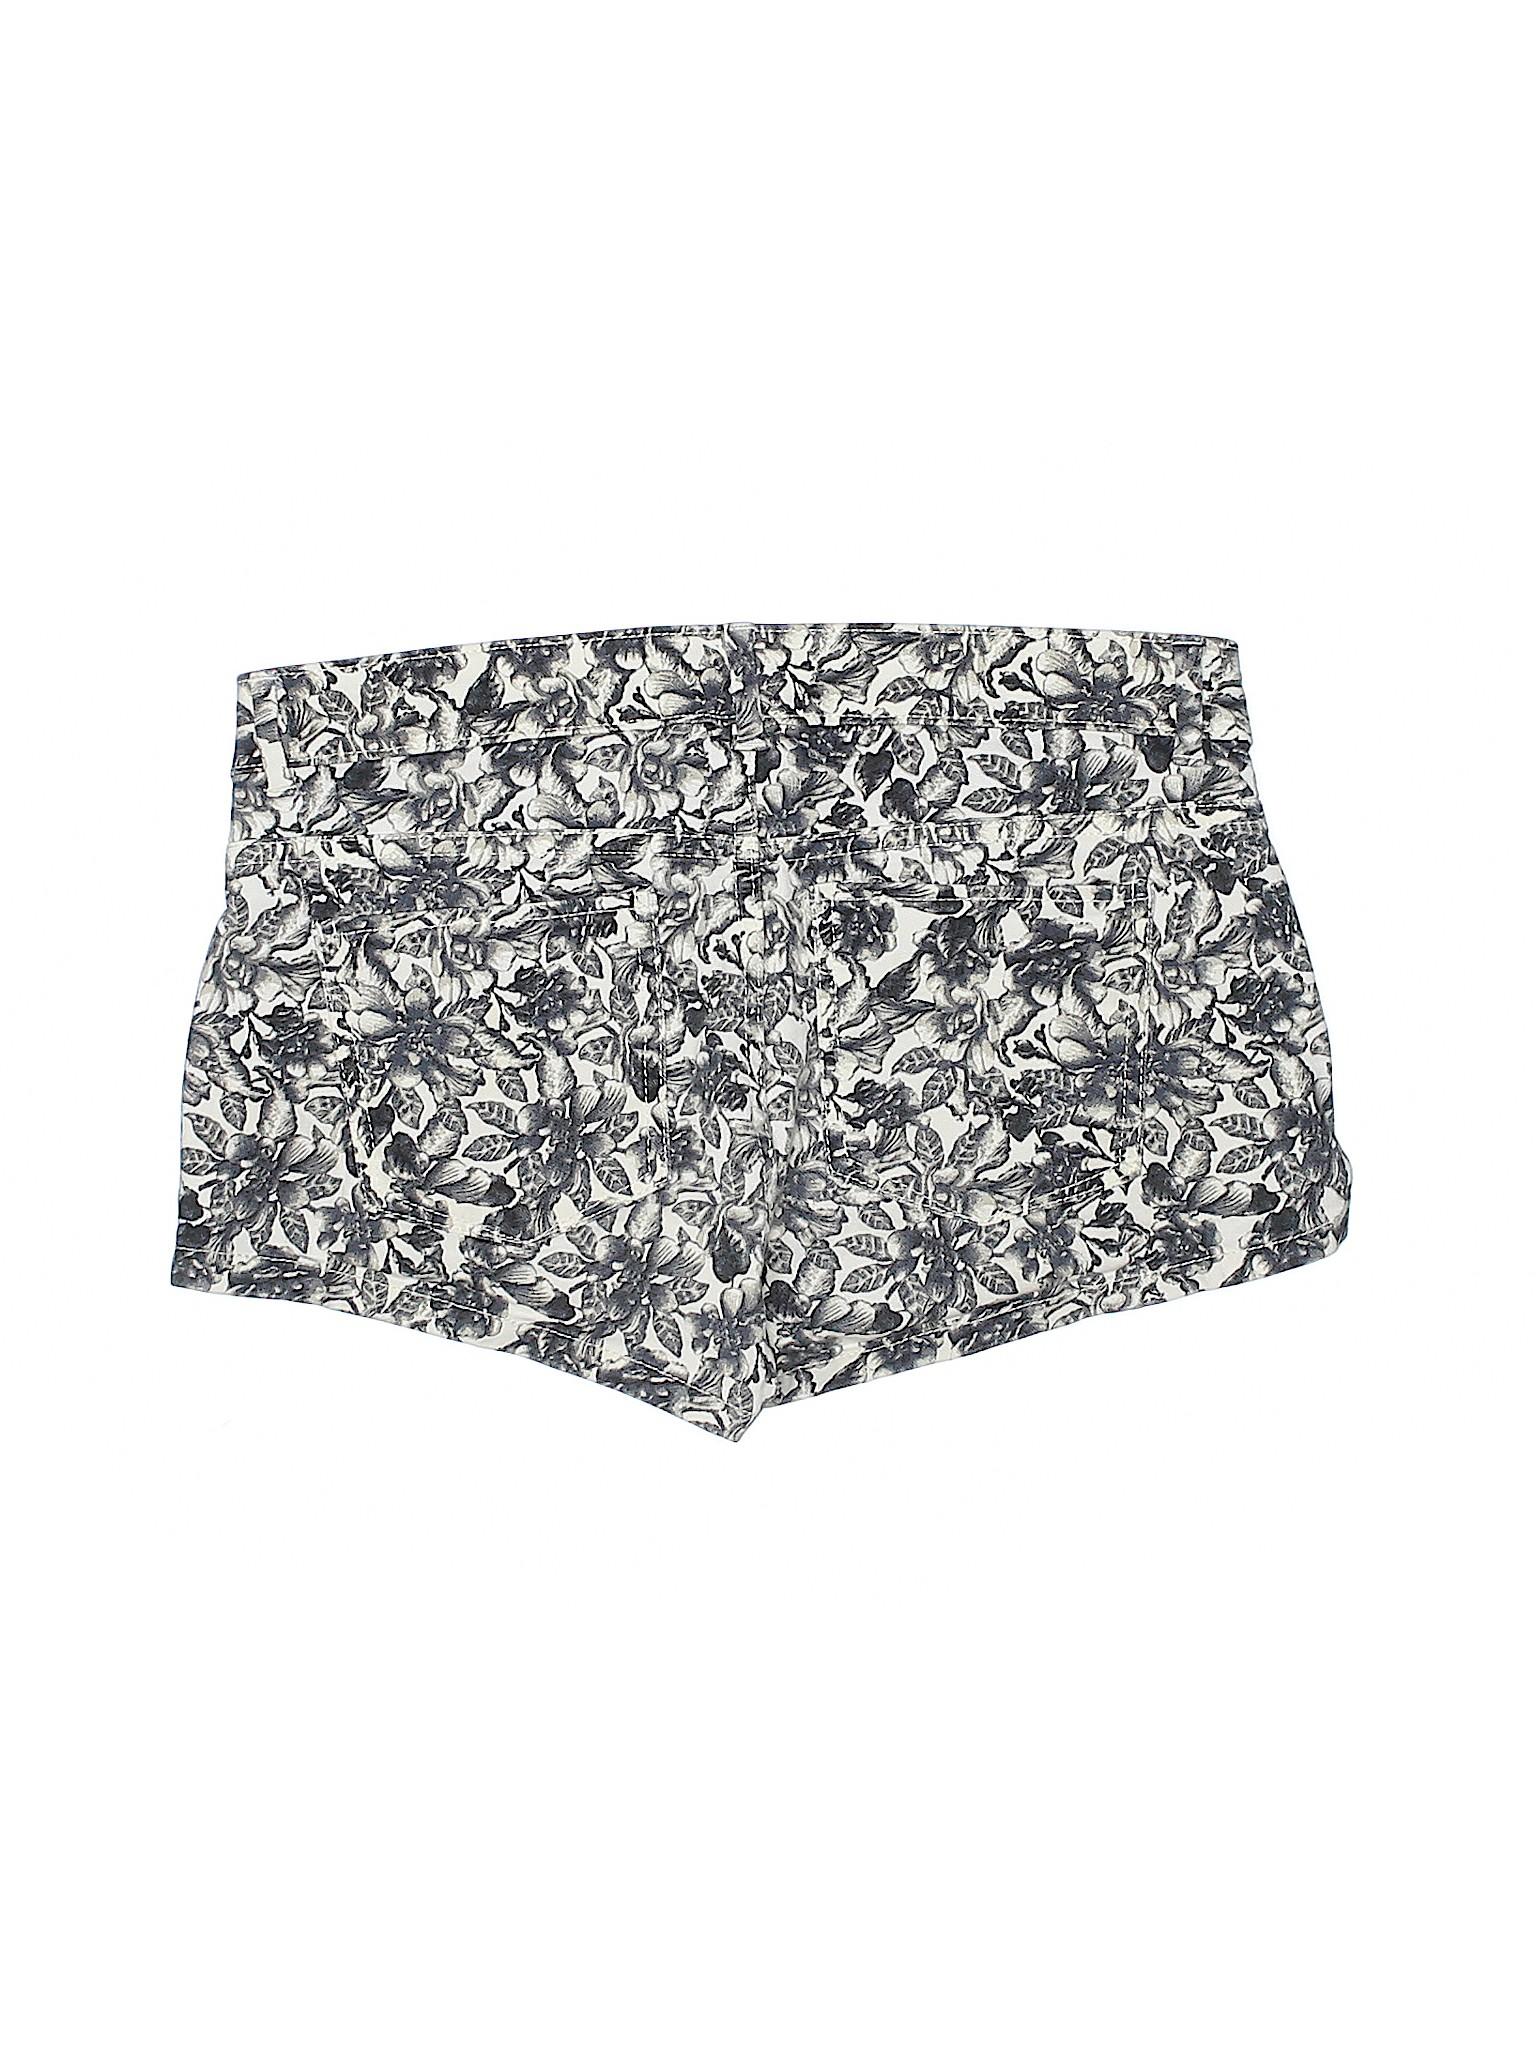 winter H Shorts Denim amp;M Boutique nvYRBHqF